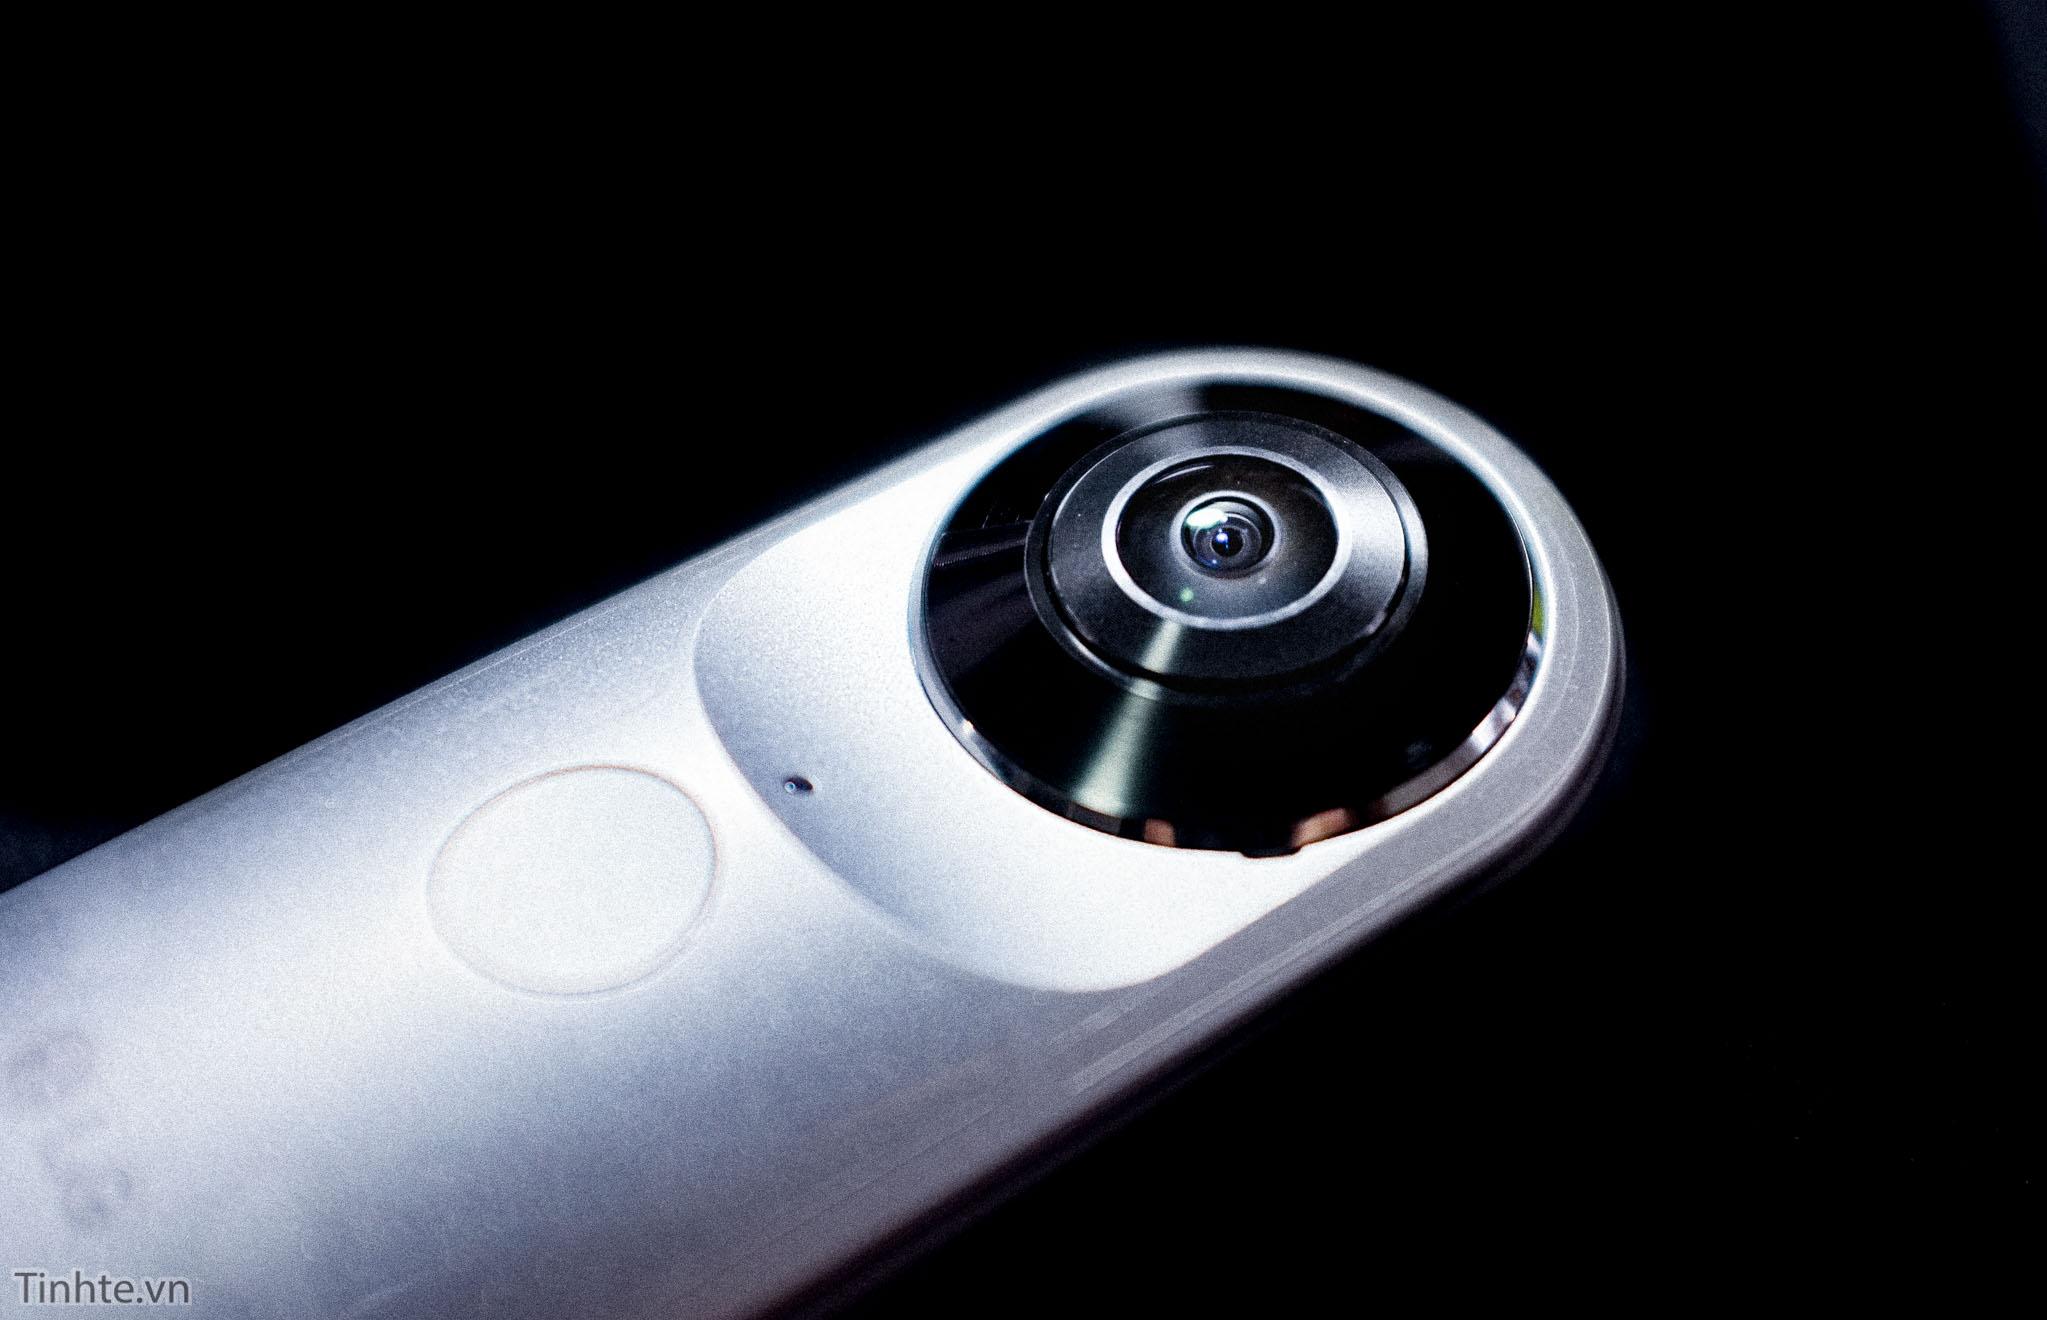 Lg-360cam-tinhte-4.jpg